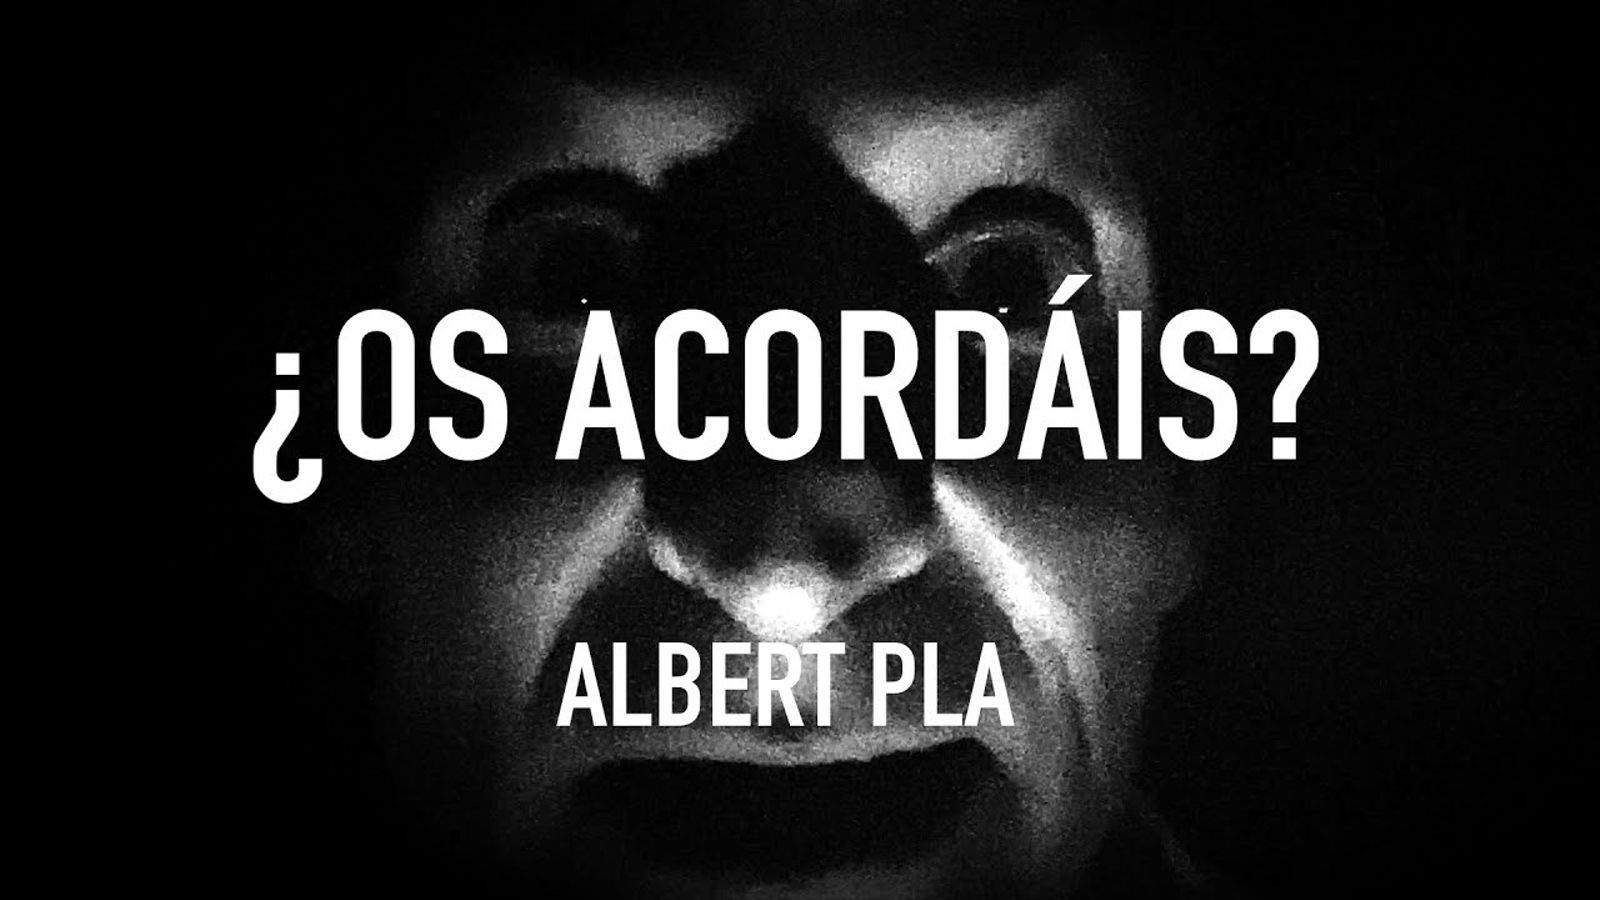 Albert Pla, '¿Os acordàis?'